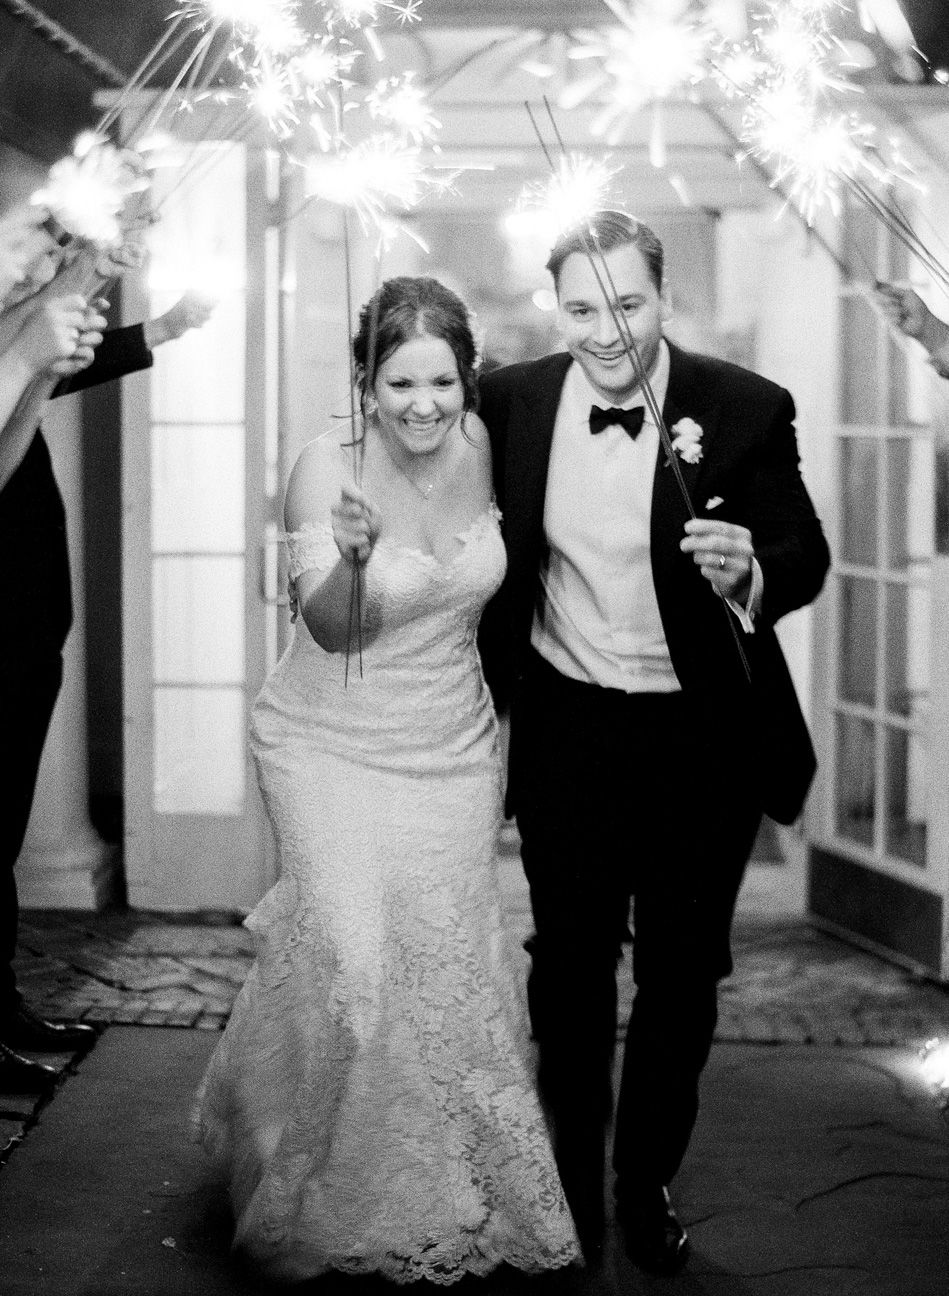 KarenHillPhotography-Forlines-Wedding-1105.jpg